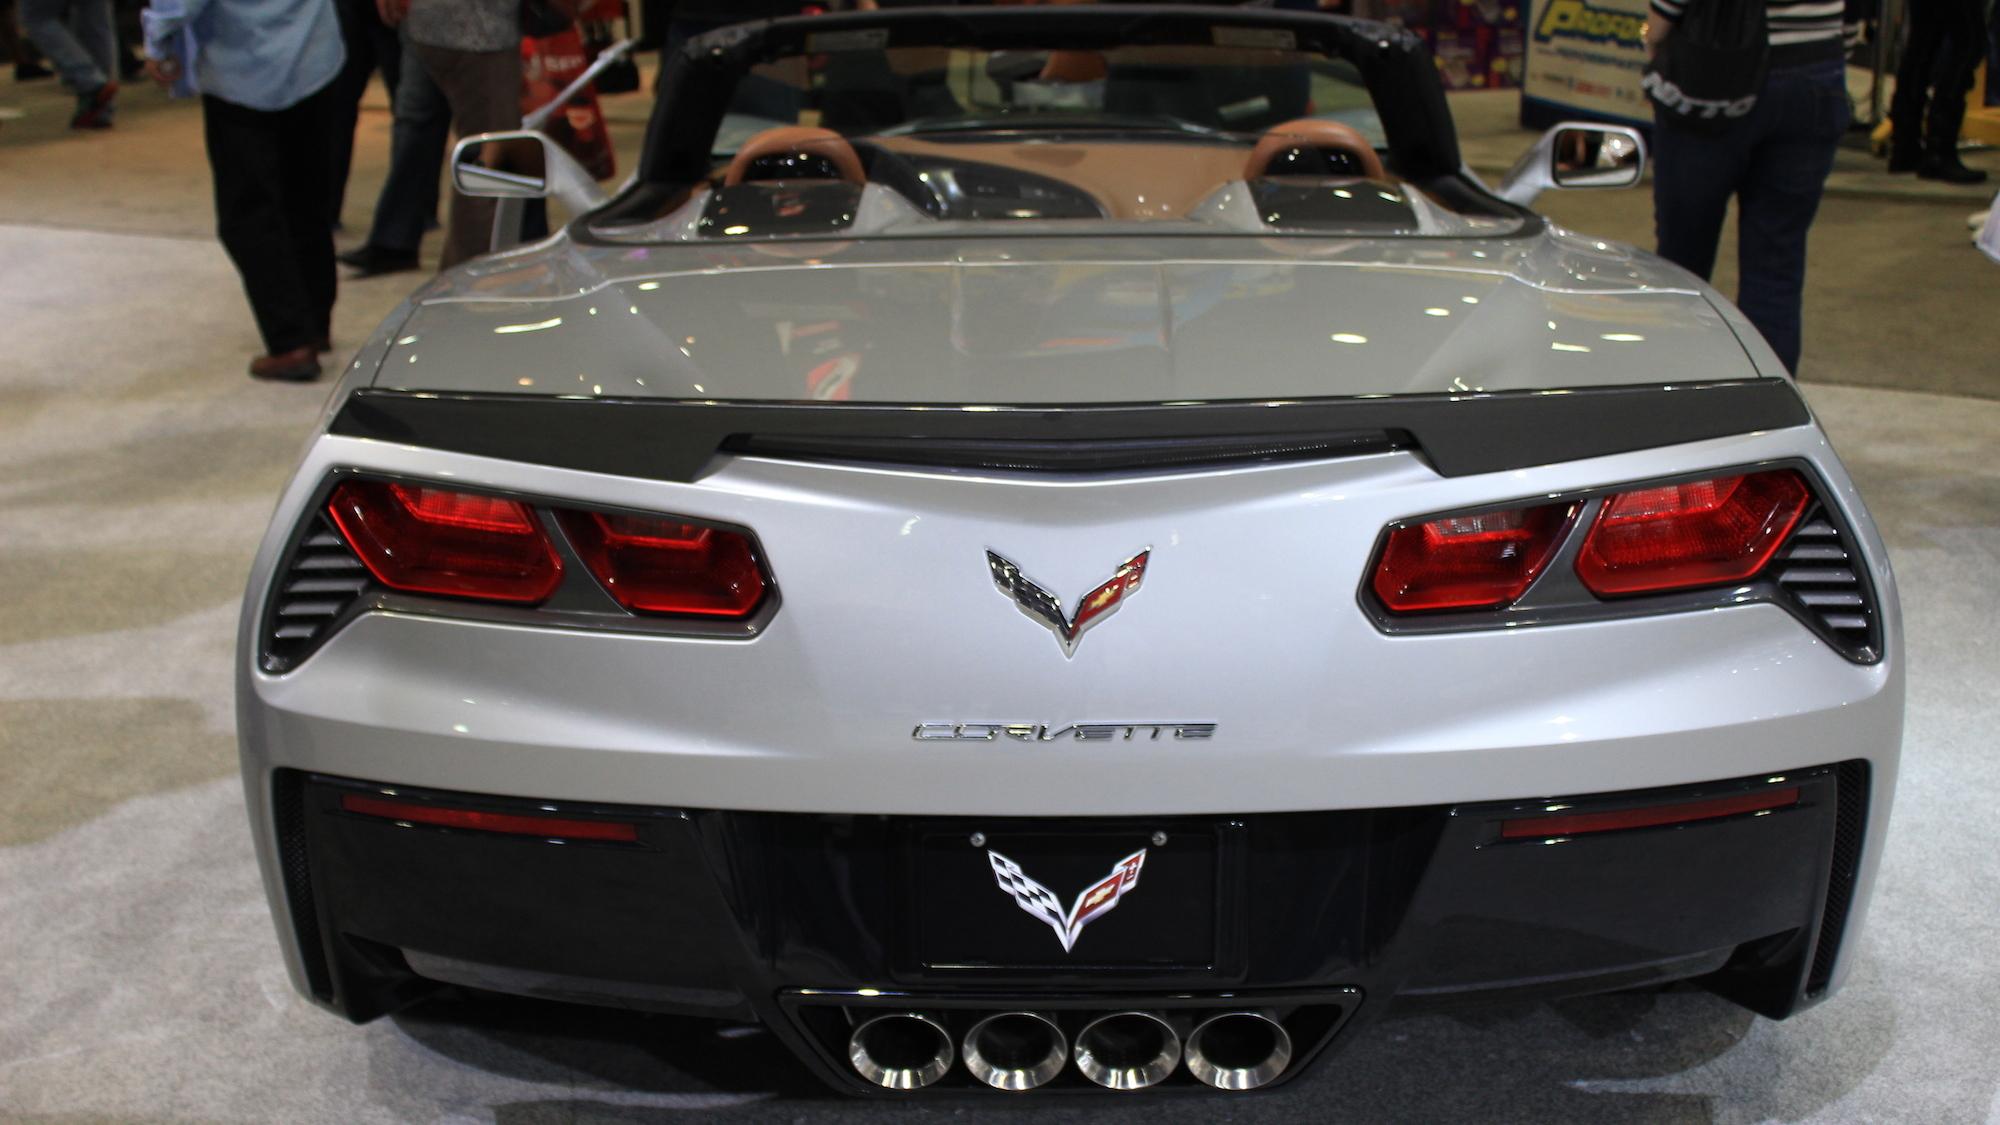 Corvette Stingray Convertible Atlantic Concept, 2013 SEMA Show